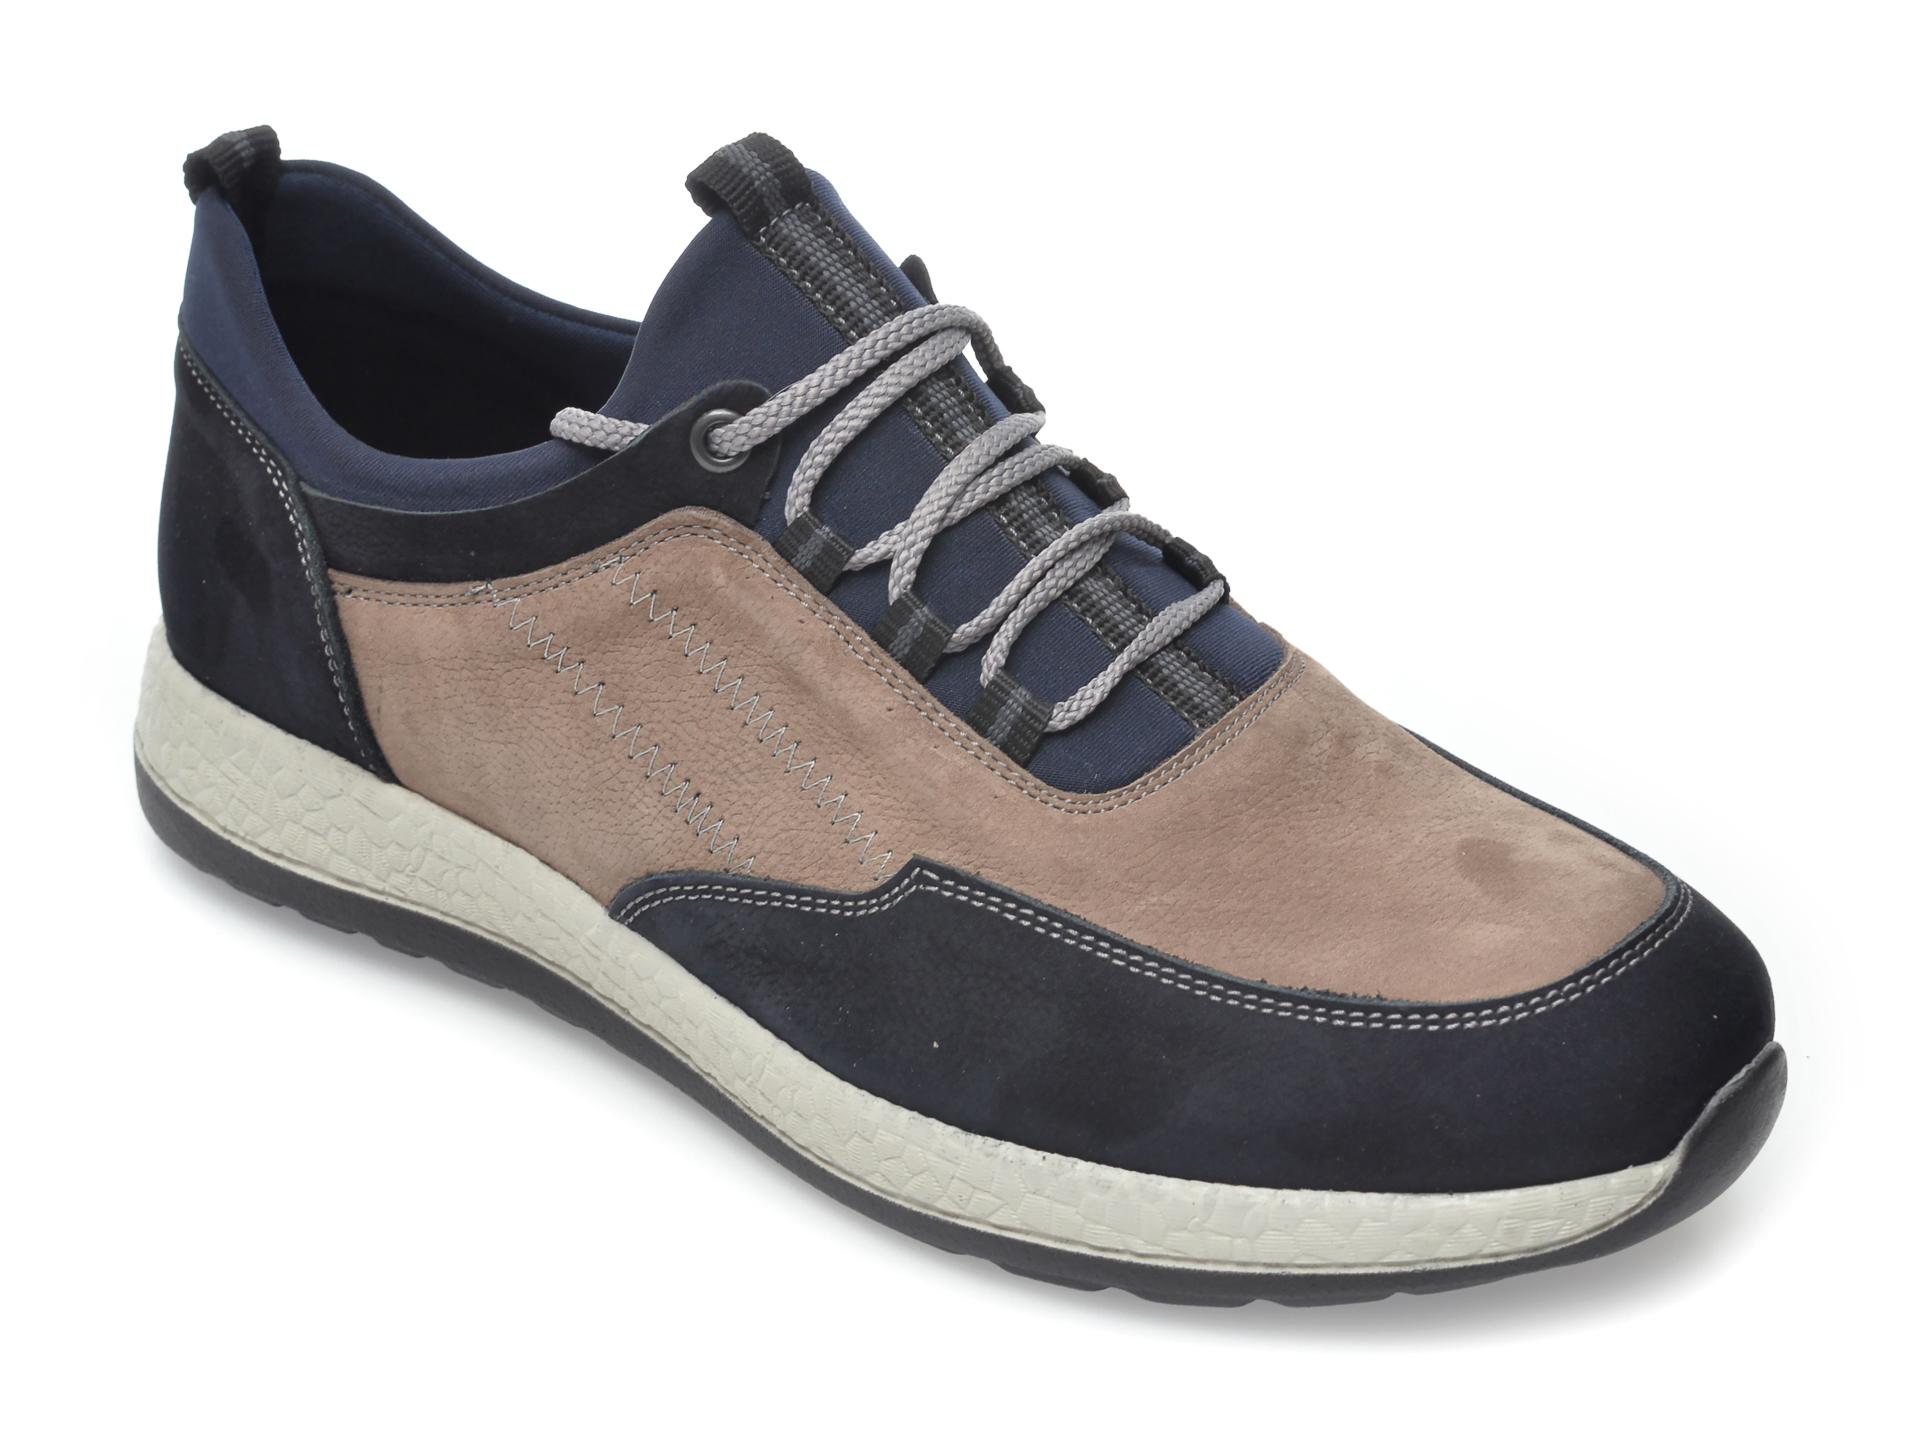 Pantofi OTTER bleumarin, 22172, din nabuc imagine otter.ro